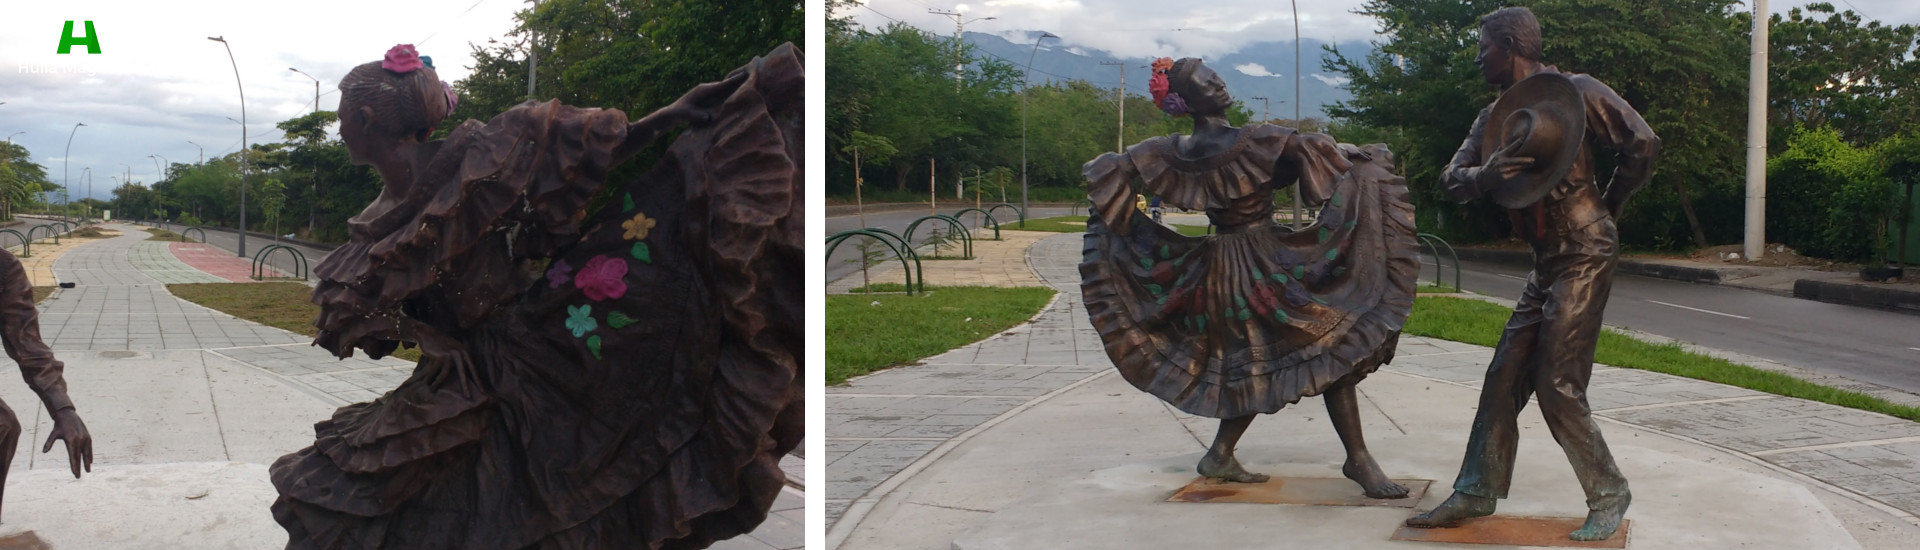 Monumentos al Baile Sanjuanero Huilense - Neiva - Slider - Huila Magnífica